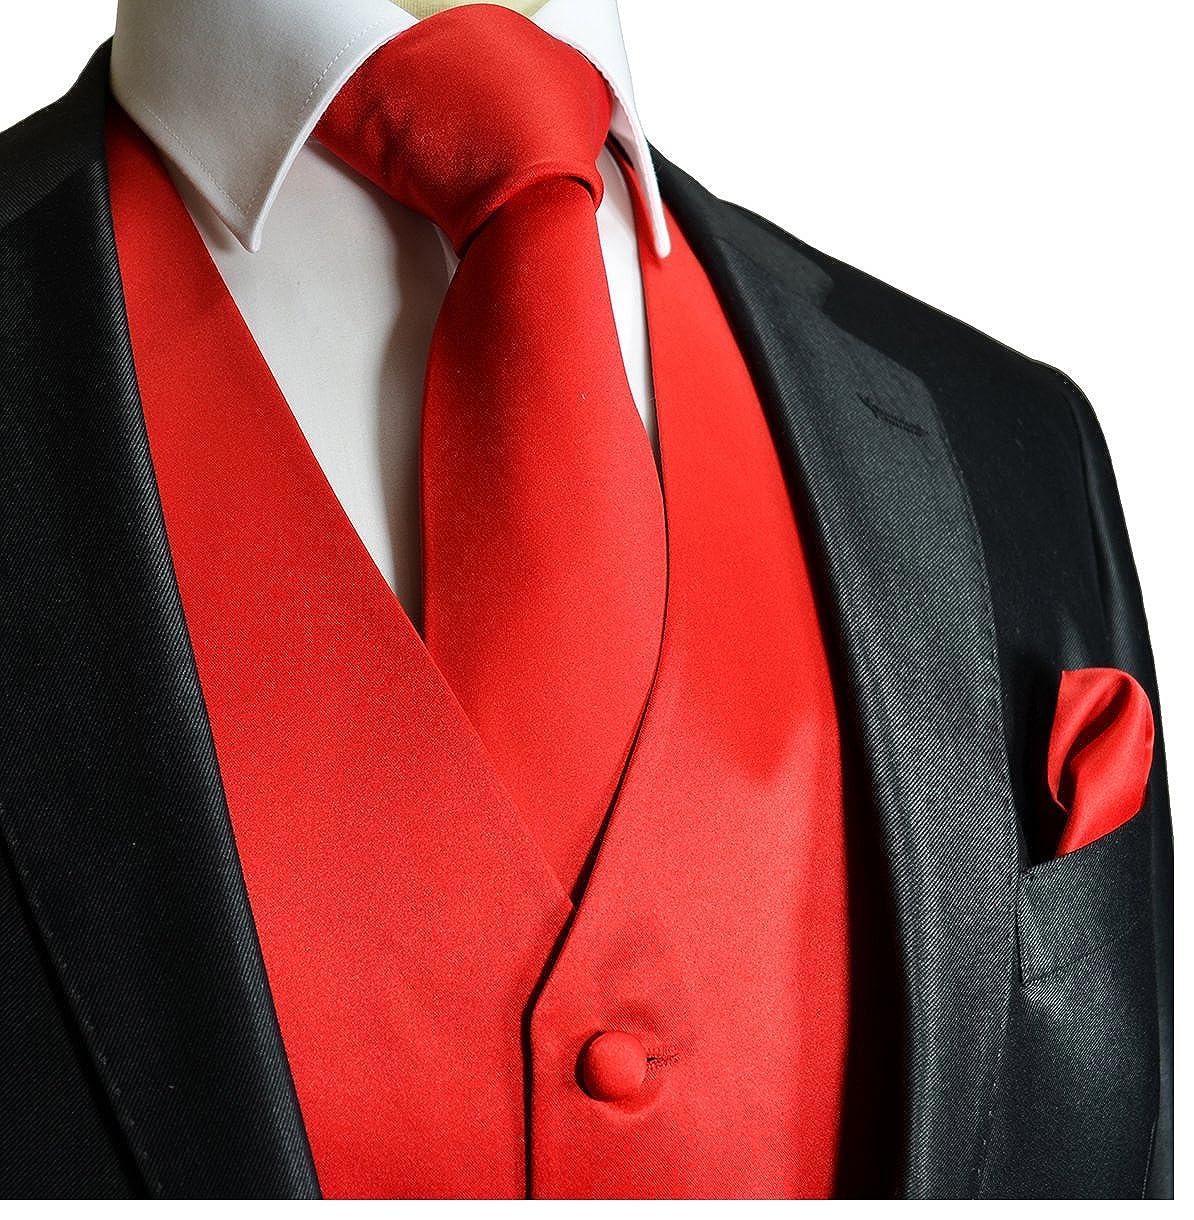 Brand Q Wedding Vest Set Solid Red 3pcs Tuxedo Vest Necktie Handkerchief XS